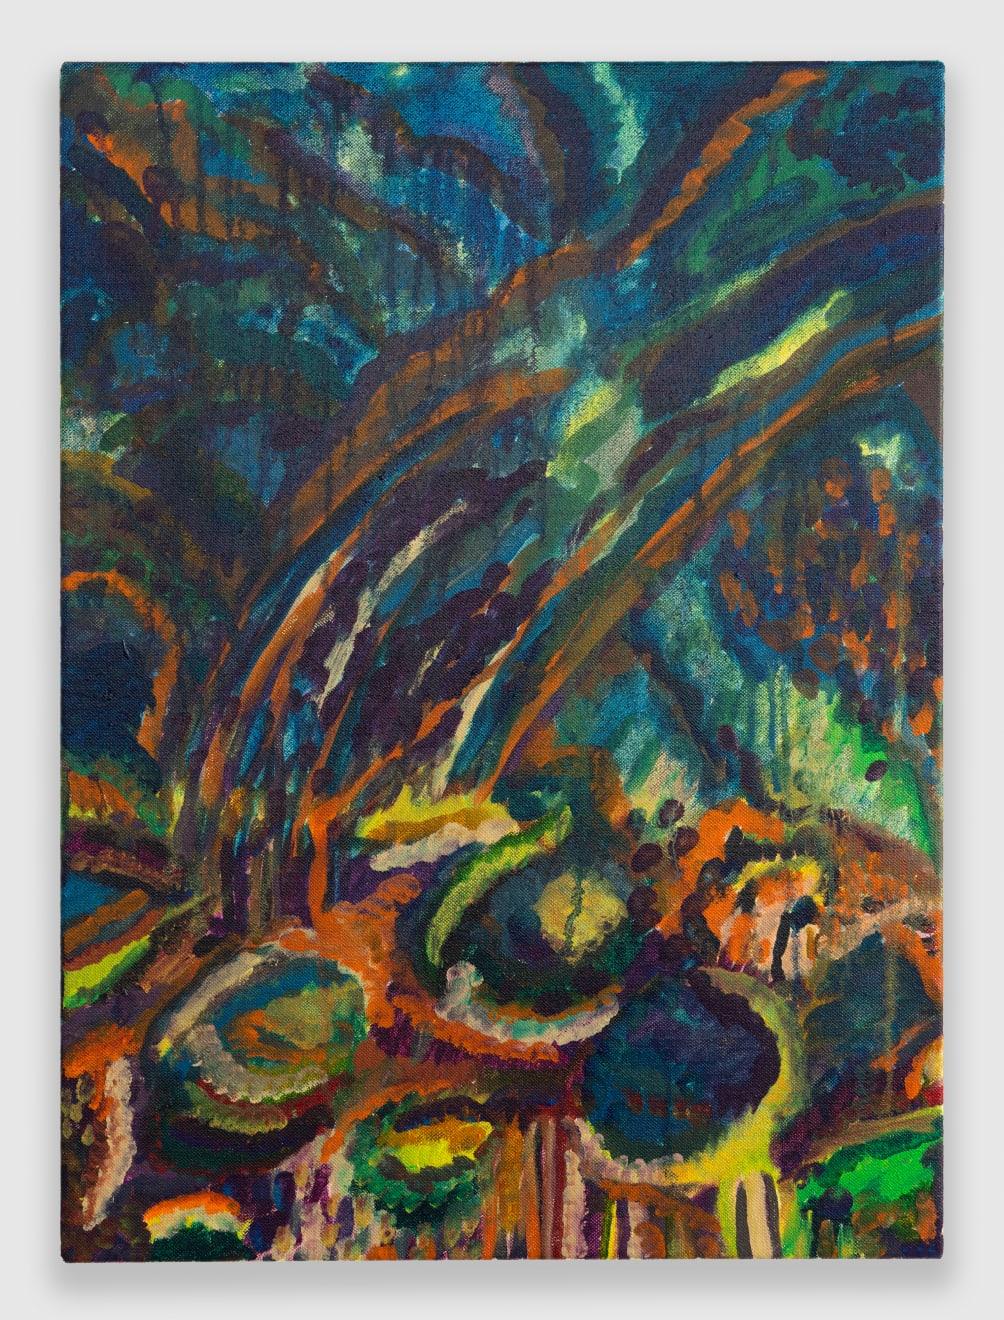 Rob Ventura, Andromeda X (Waterlilies IV), 2019